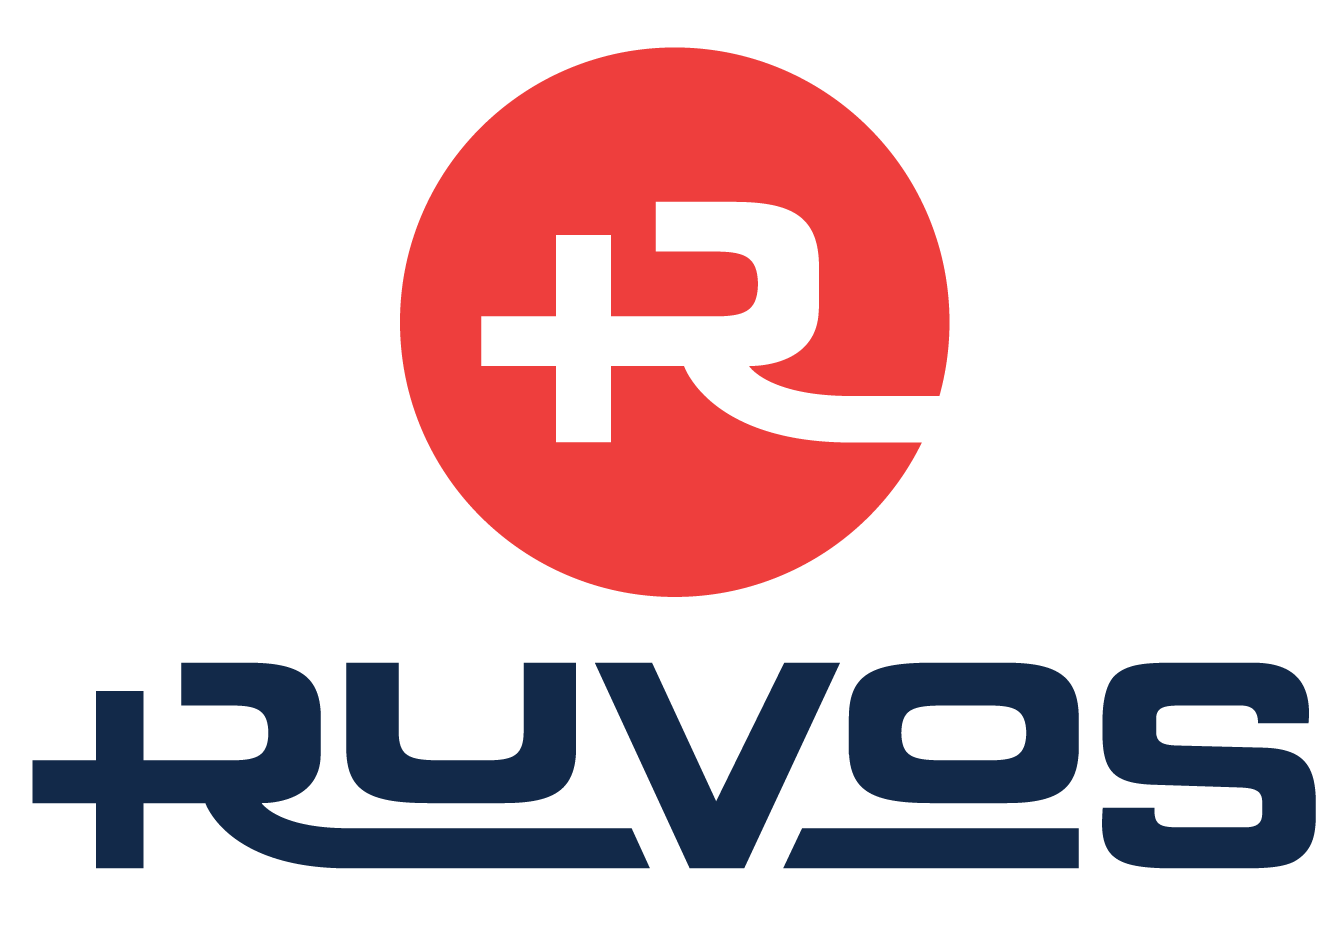 Ruvos.png